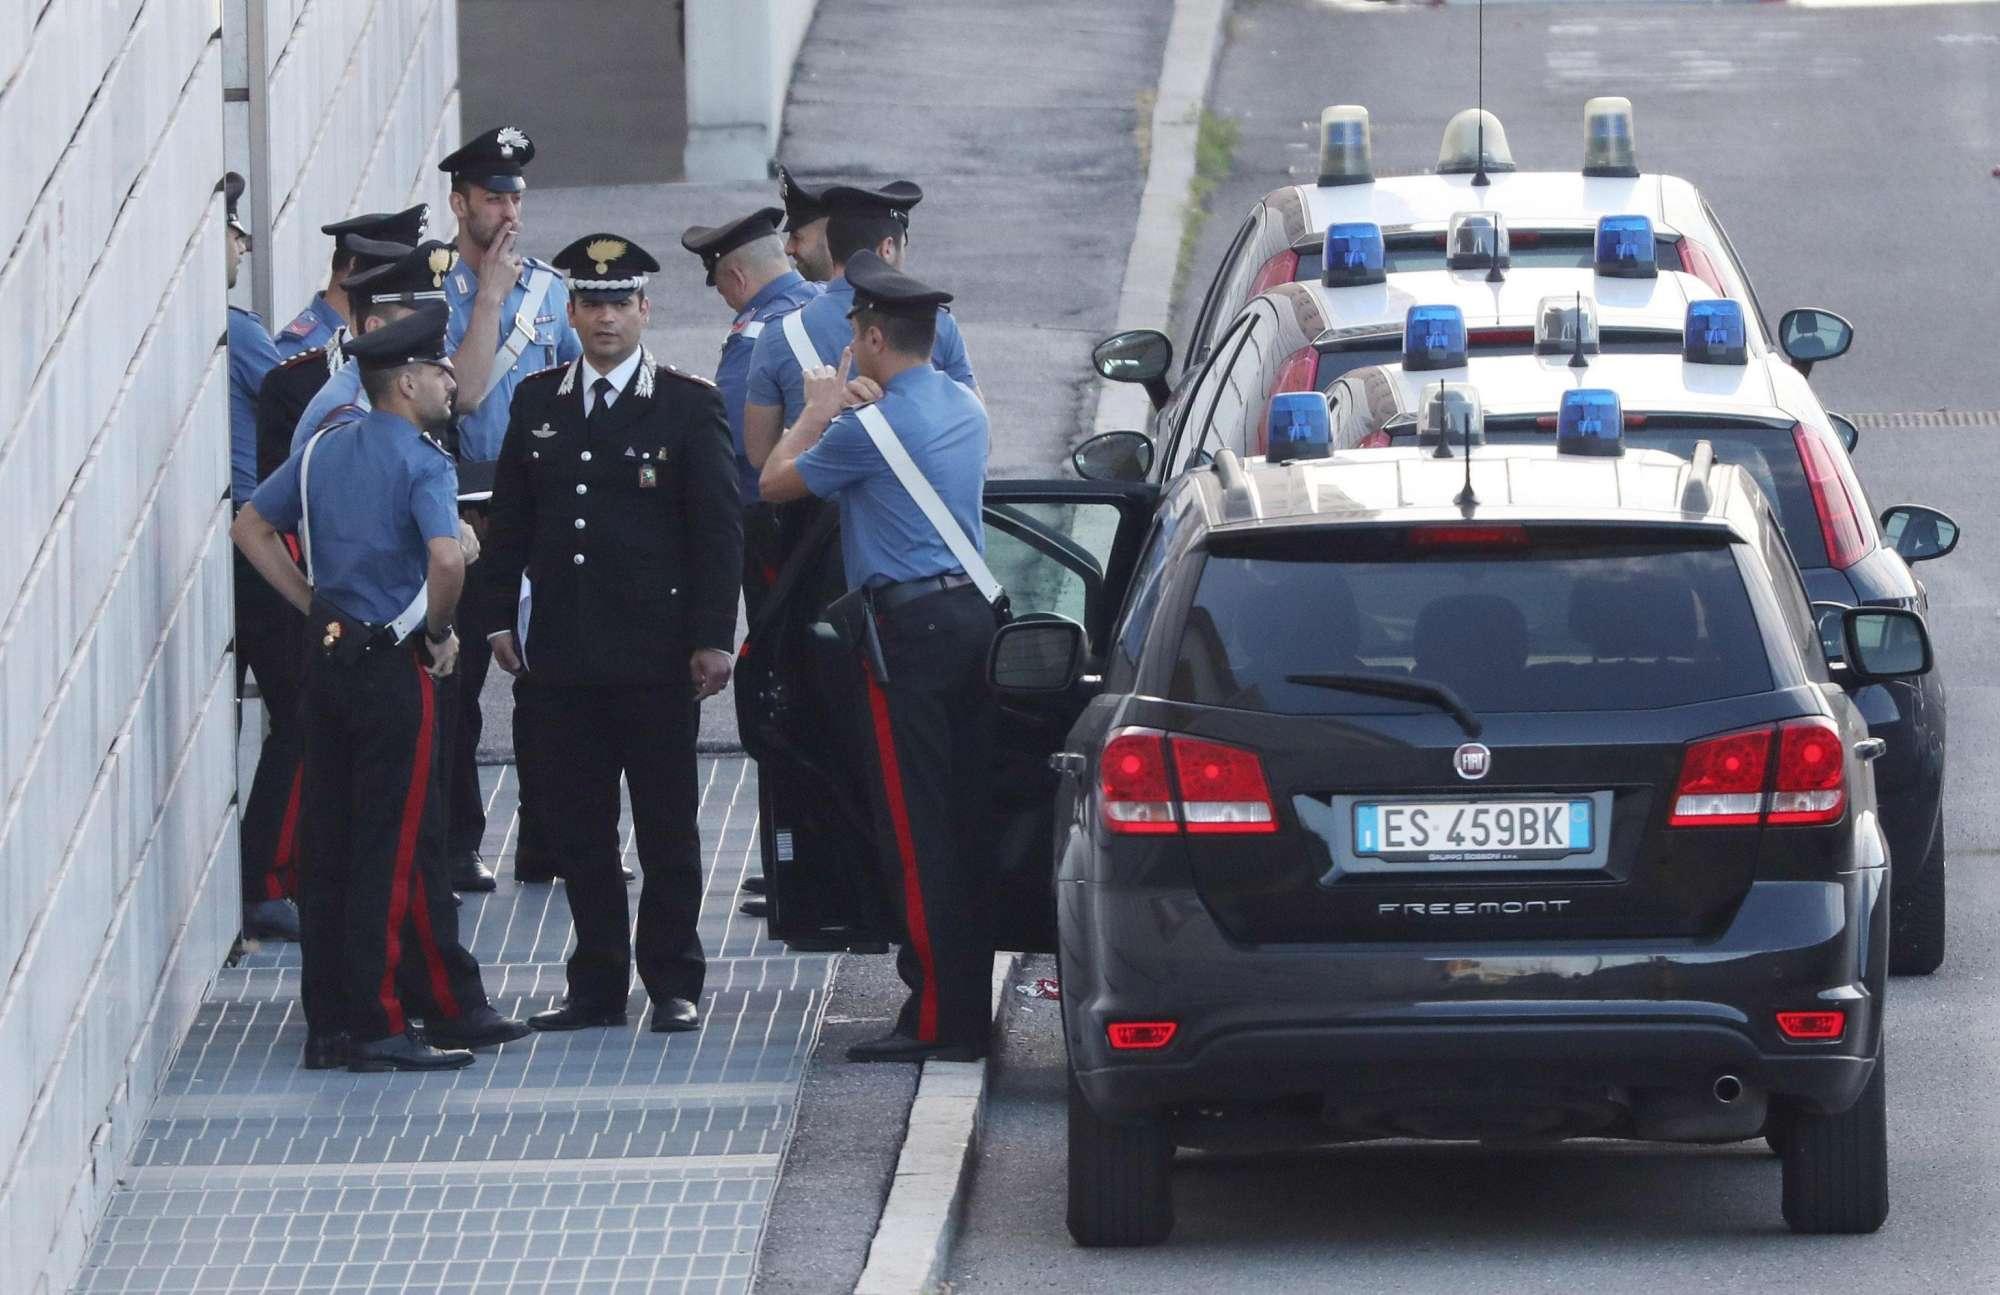 Yara, l arrivo di Bossetti in tribunale per l appello